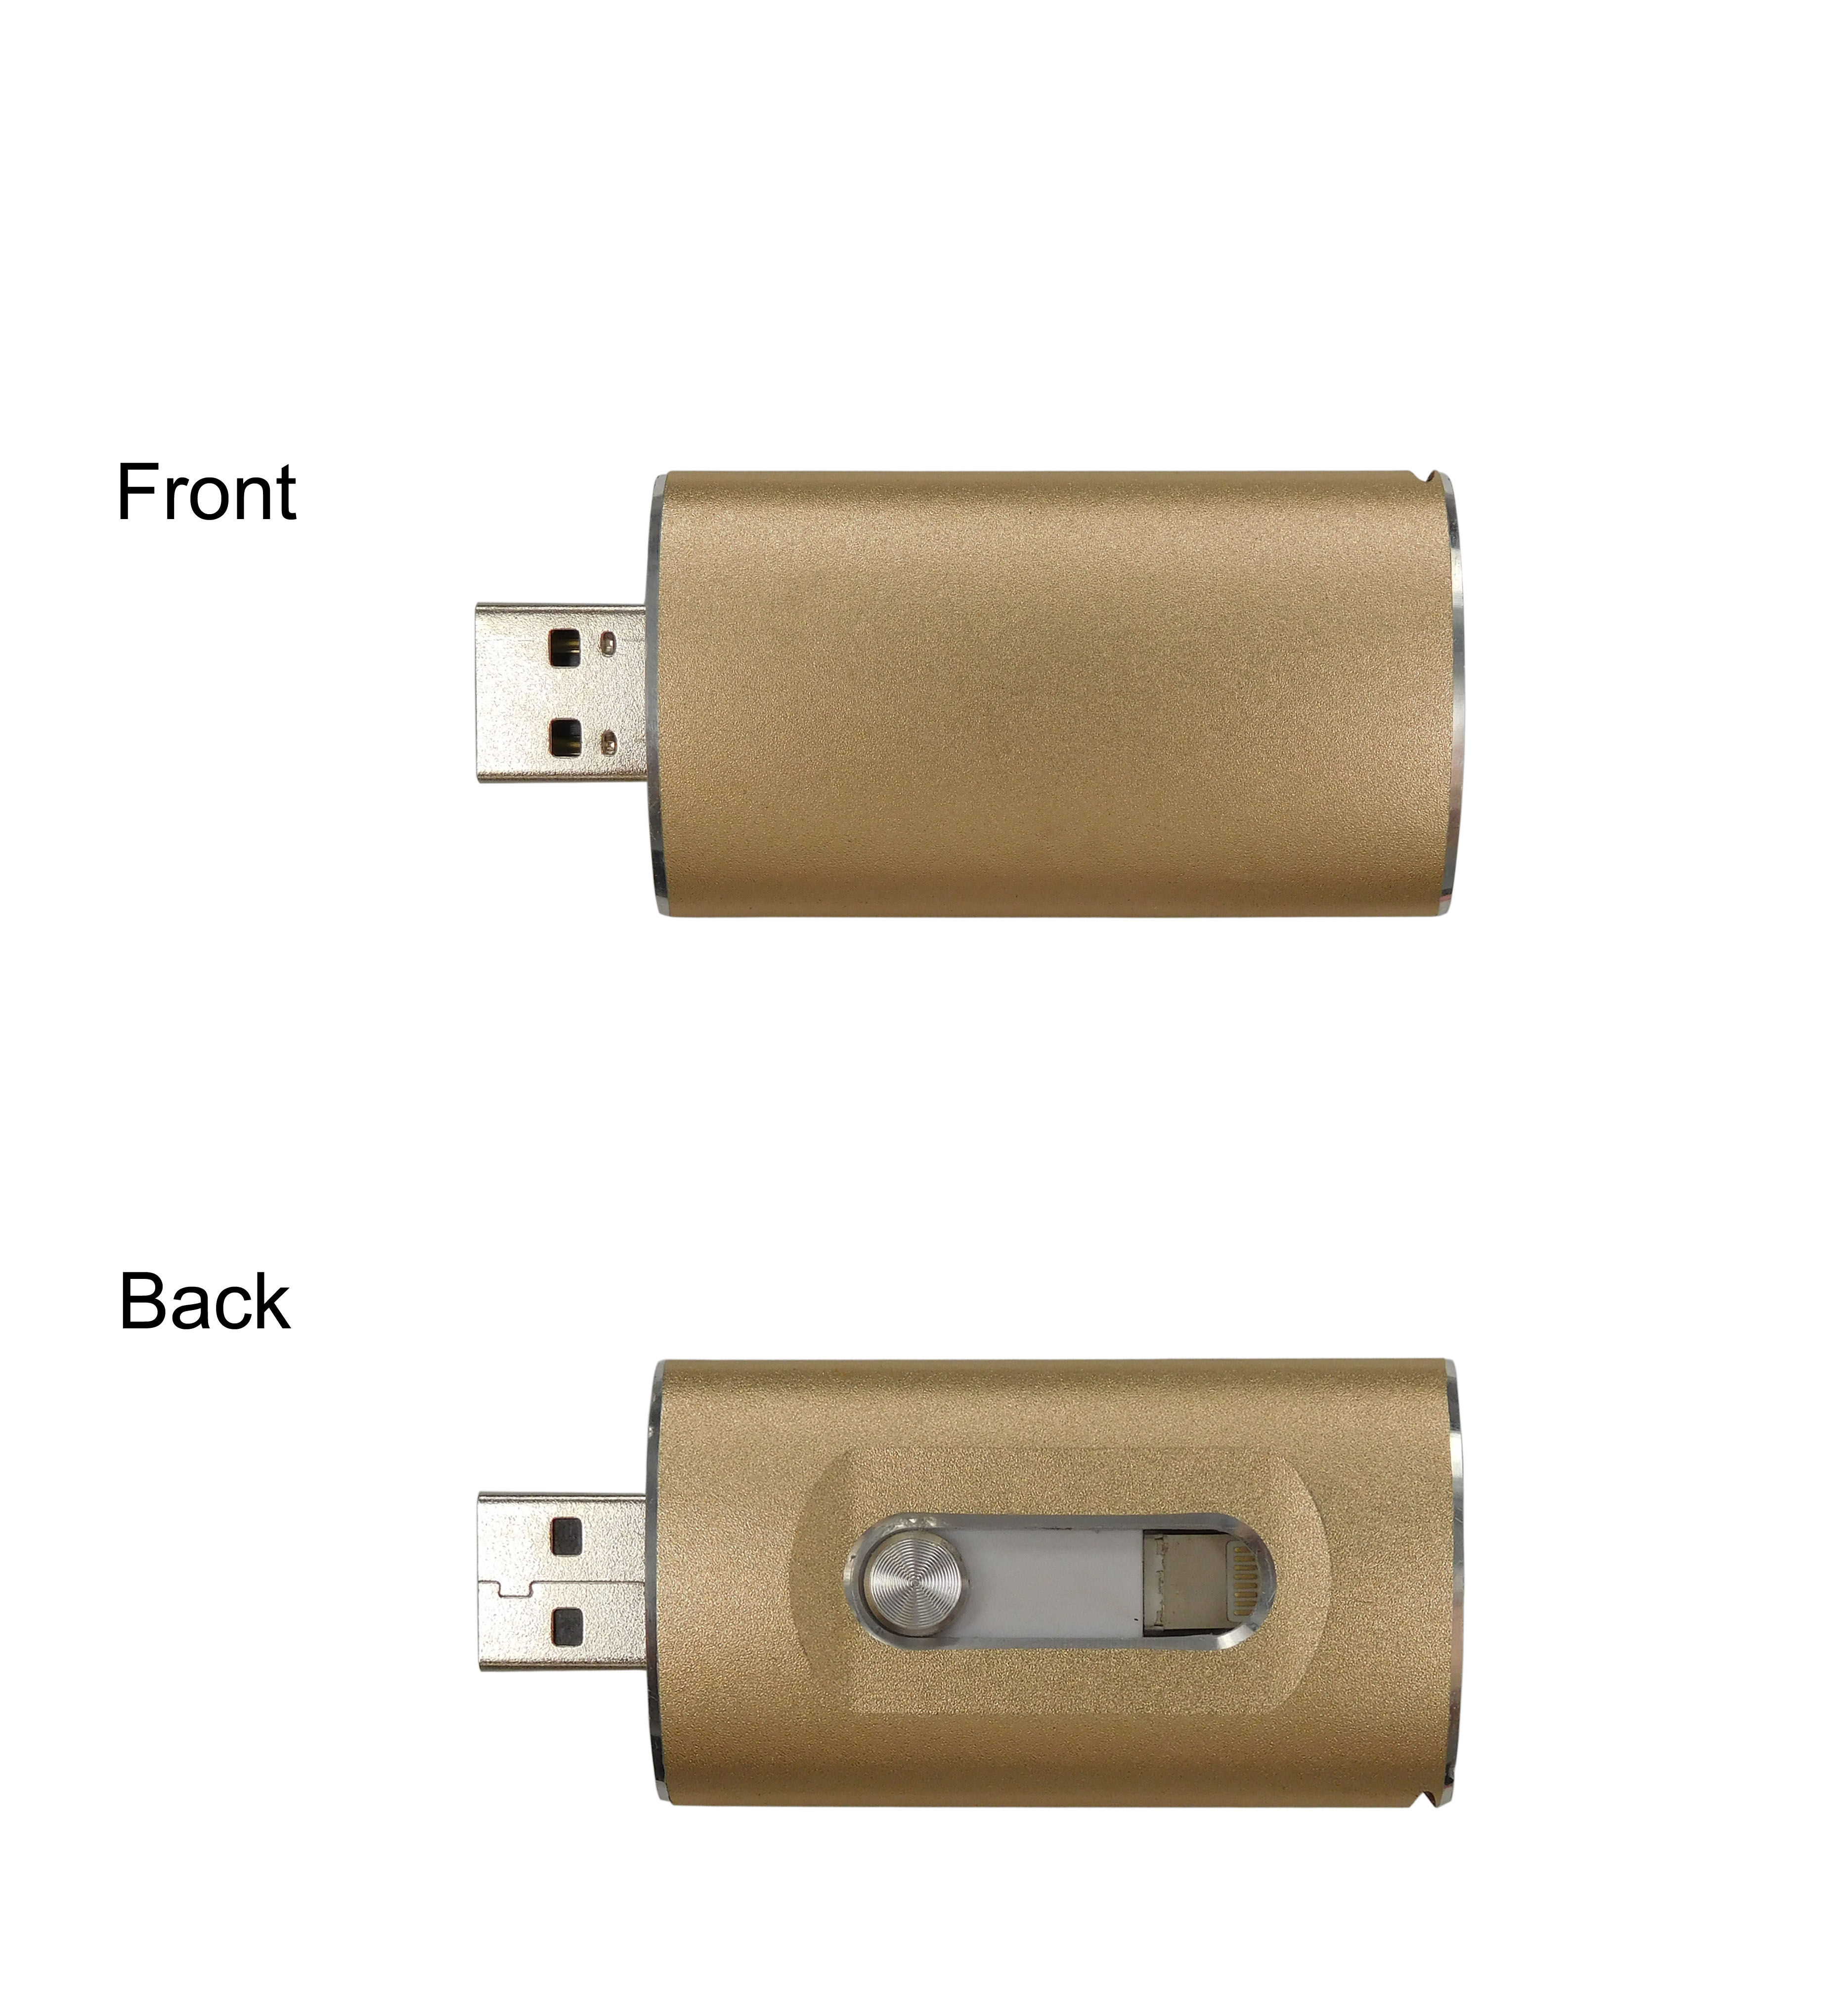 ios custom usb flash drives for iphone ipad in all colors